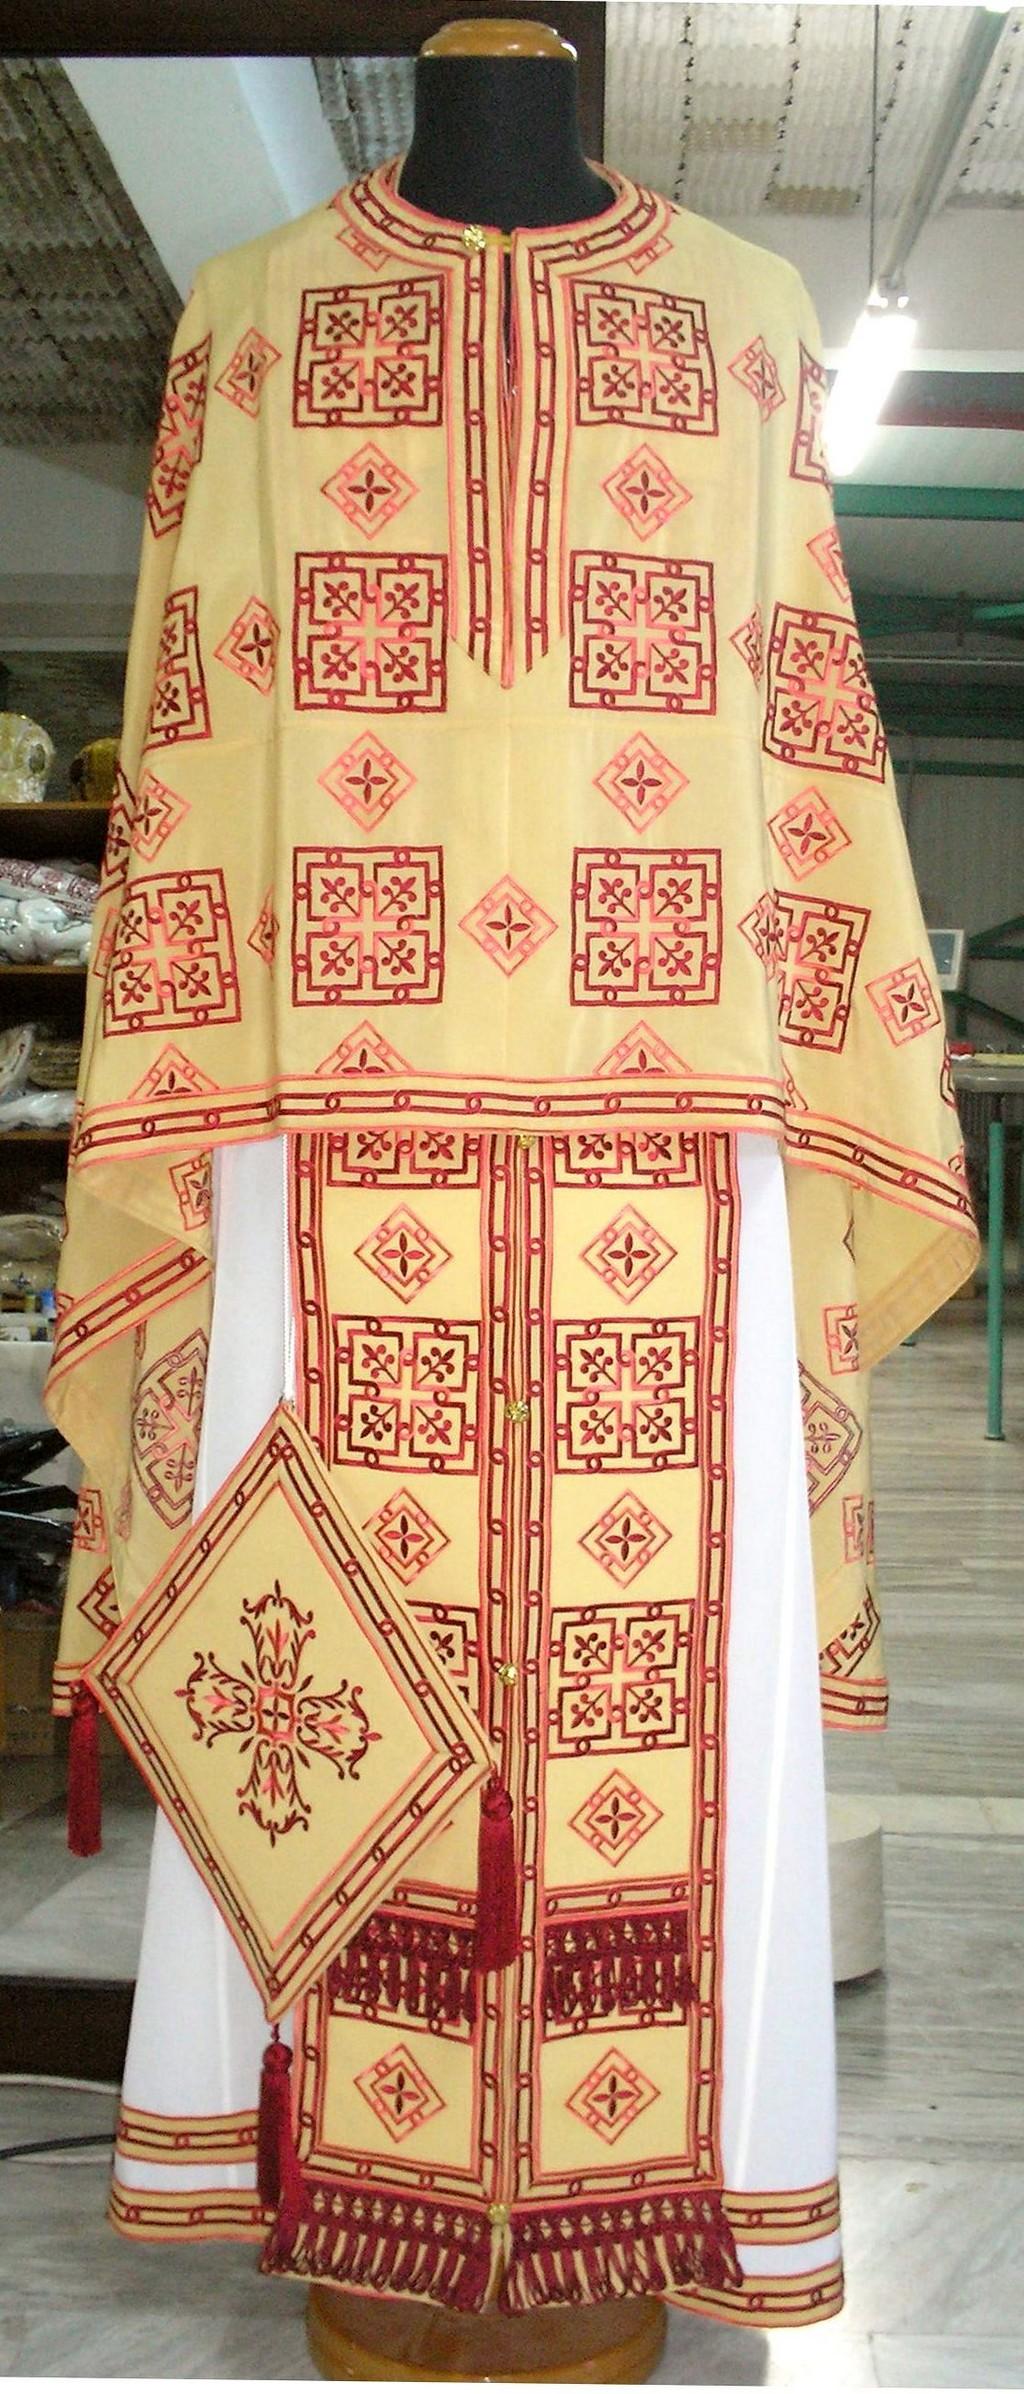 Saint Andrew - Hieratical Robe